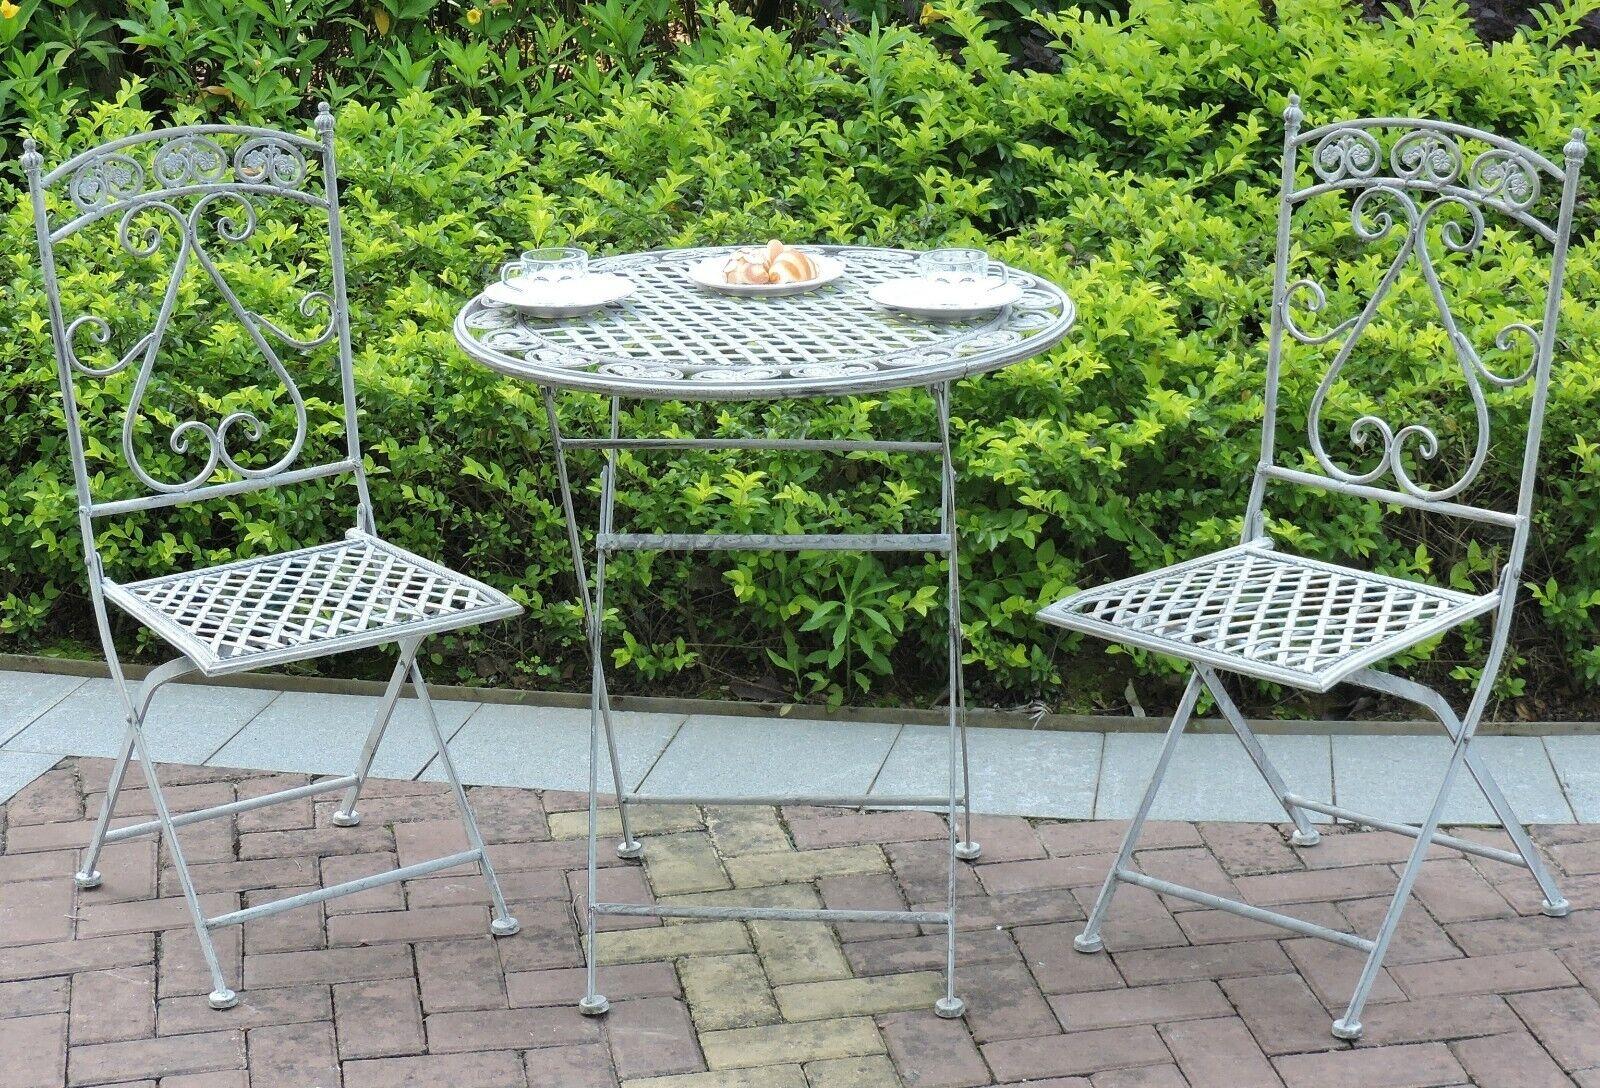 Metal Garden Bistro Set Patio Furniture Outdoor 9 Piece Table Chairs Vintage